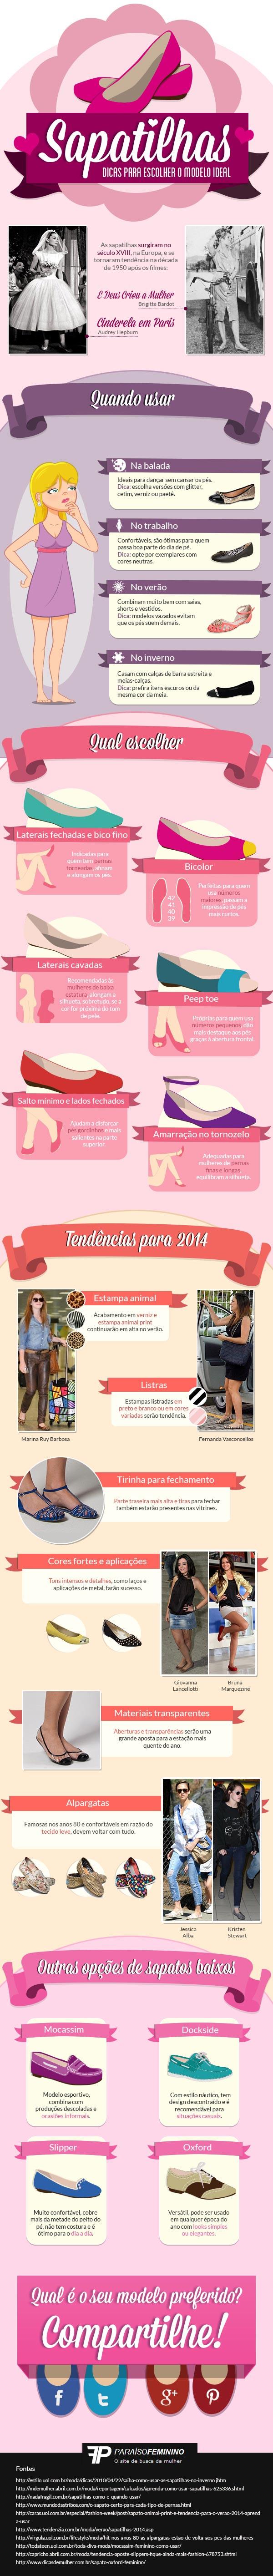 Infográfico de Sapatilhas